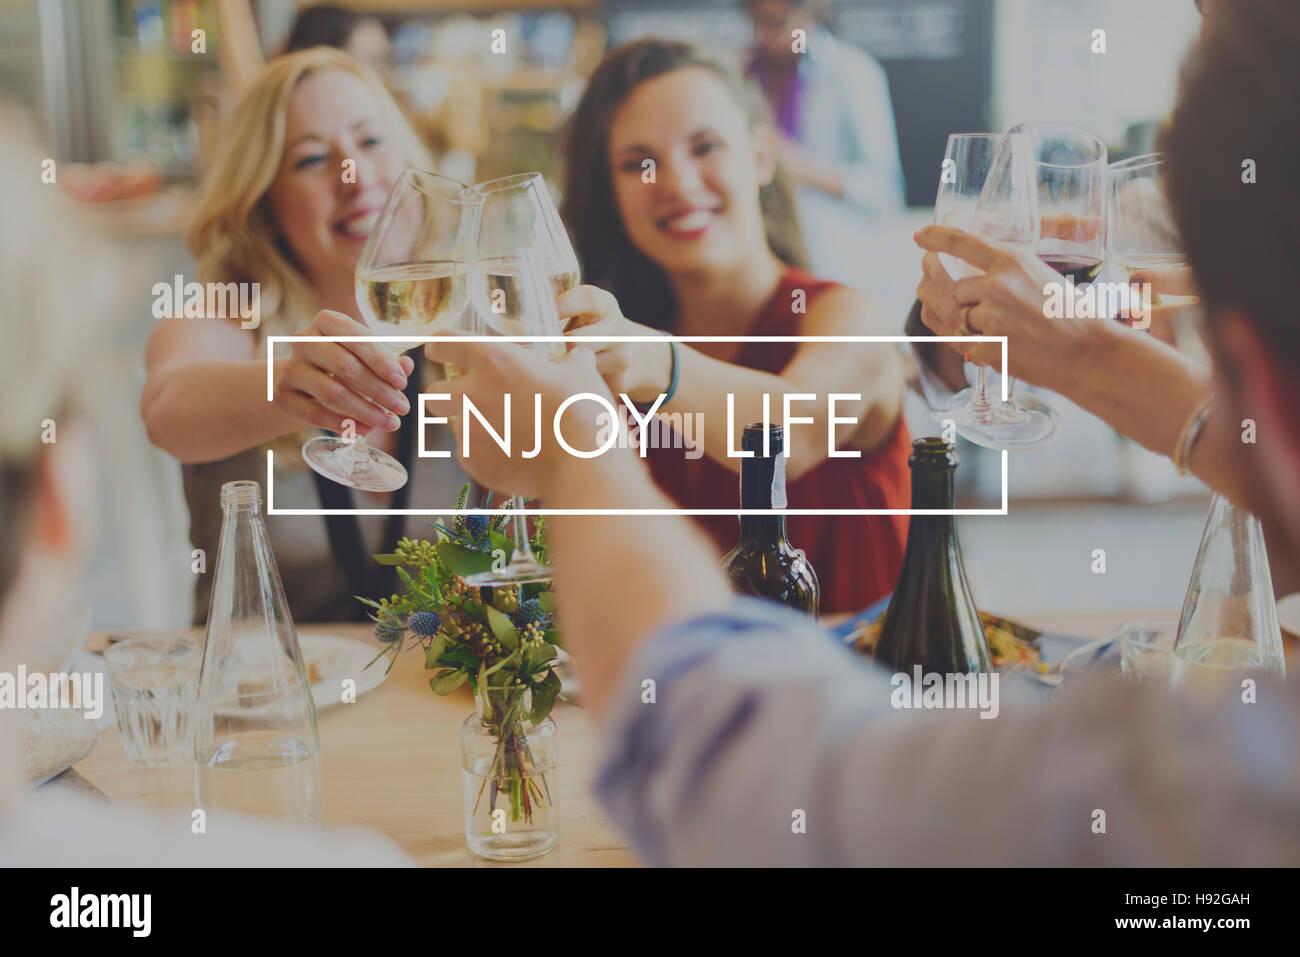 Enjoy Life Enjoyment Happiness Joy Concept - Stock Image